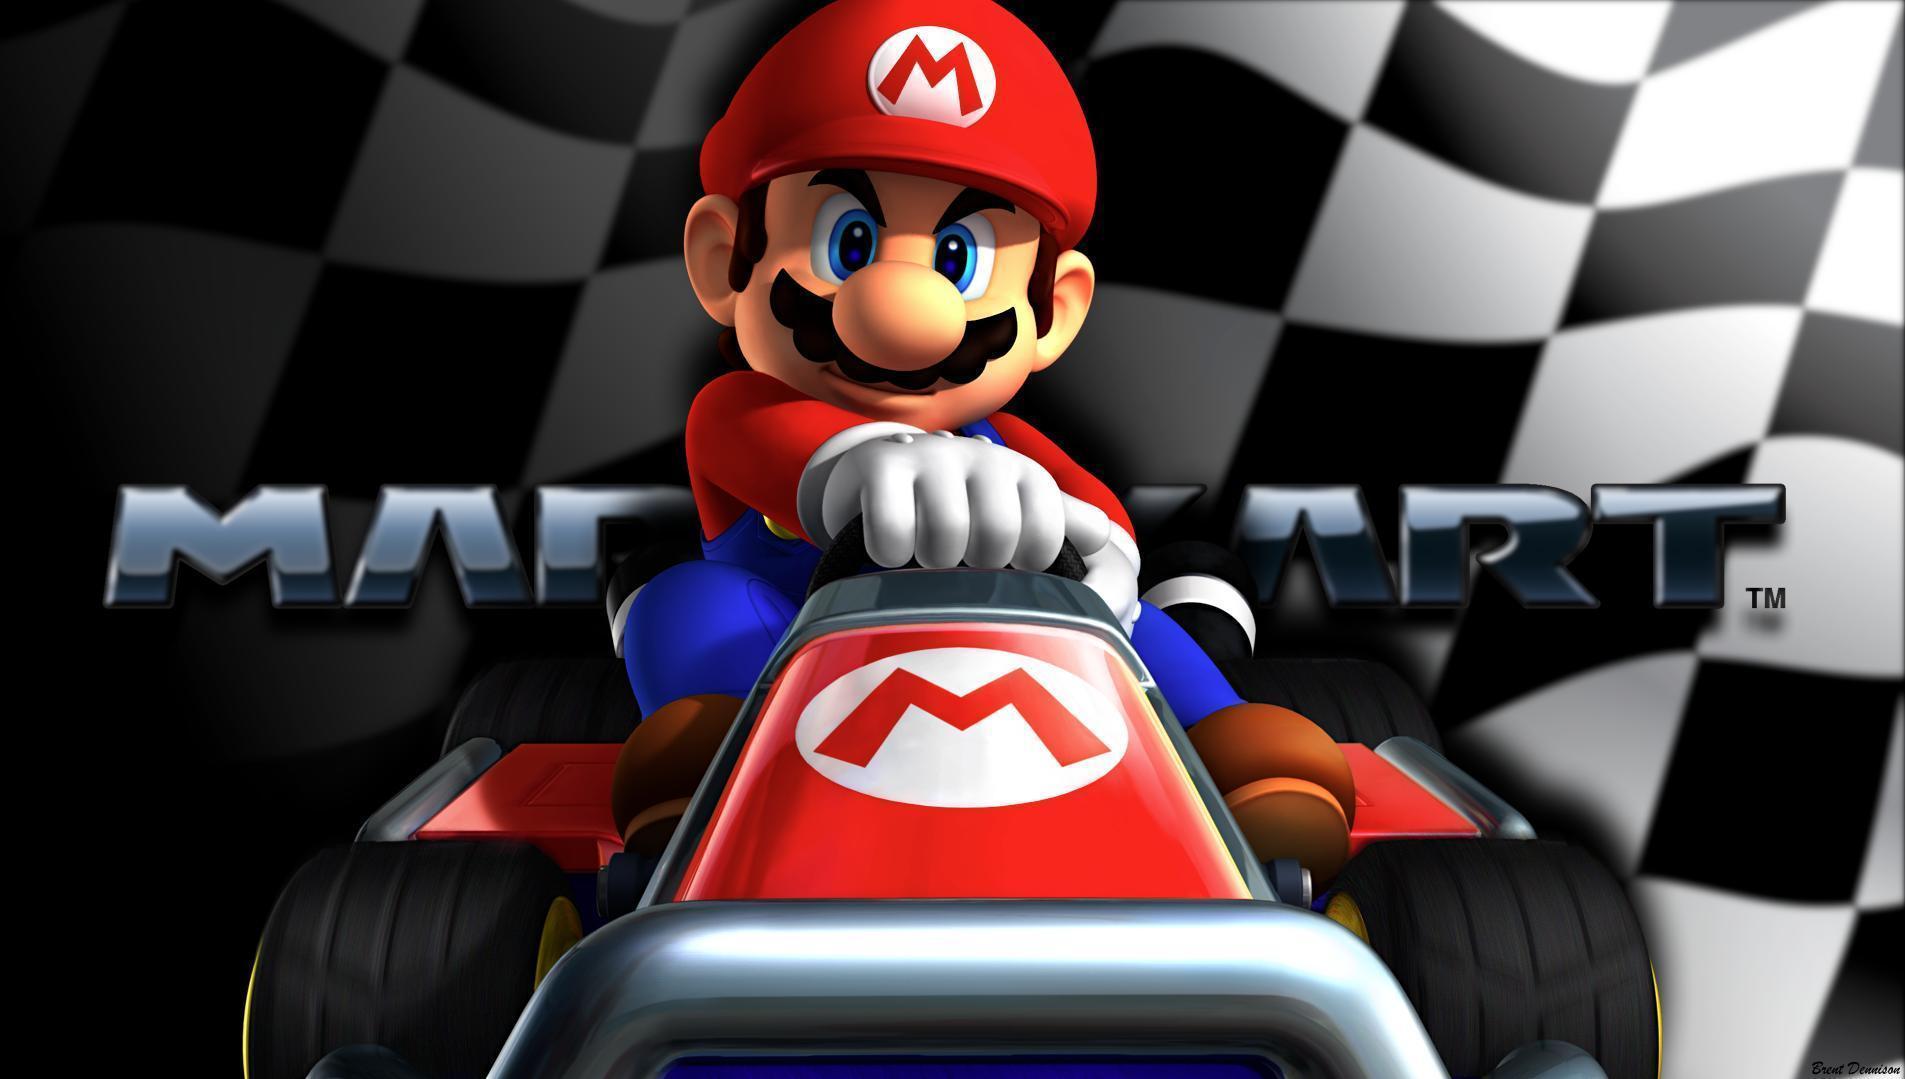 Mario Kart 8 Background